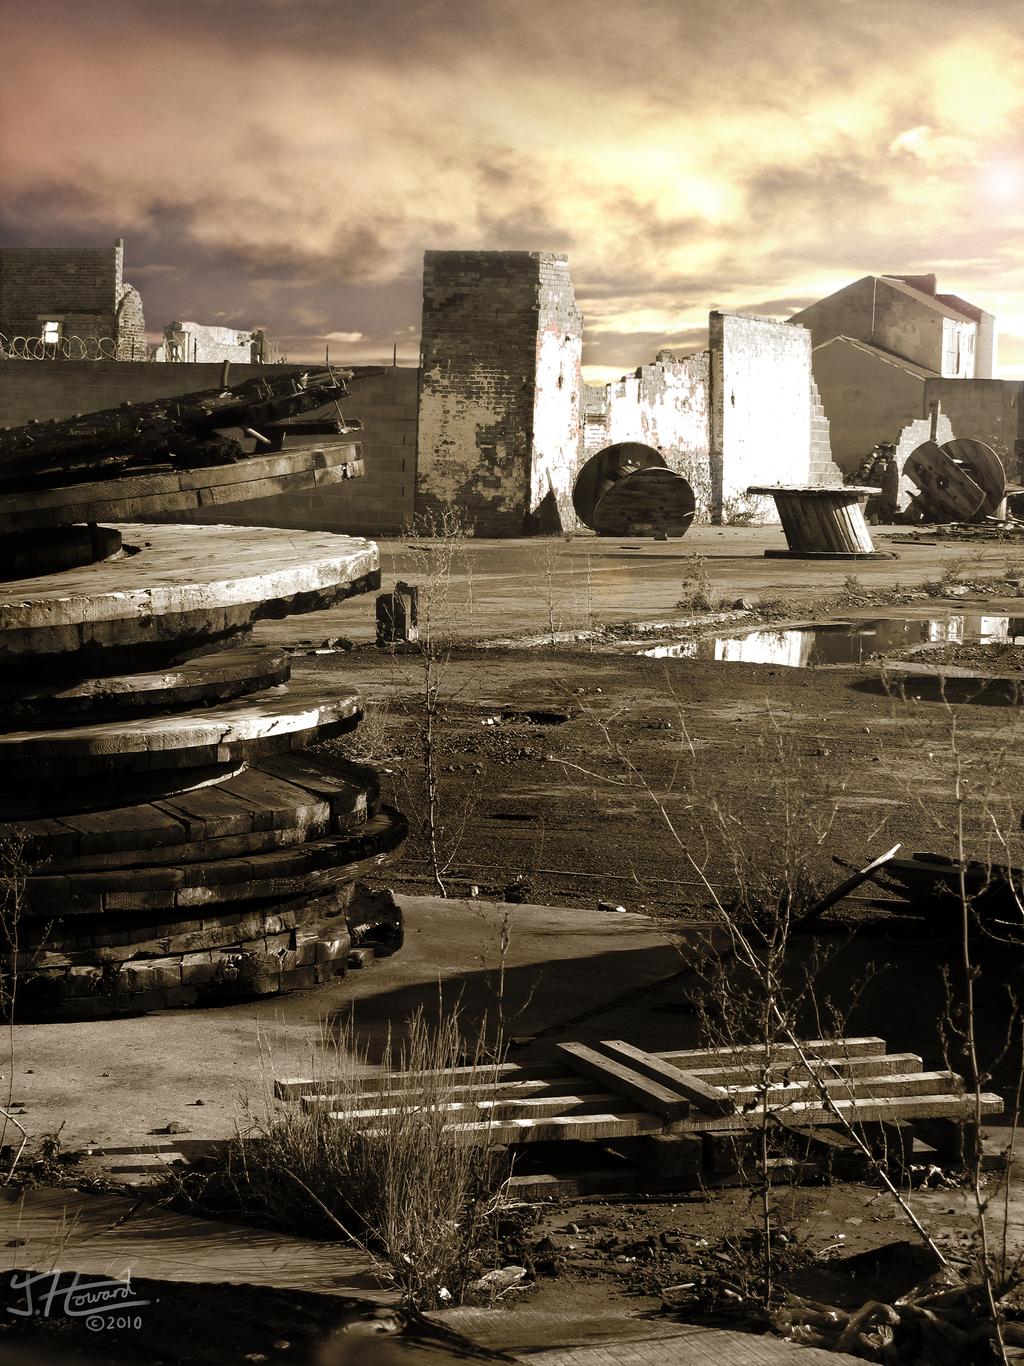 Spool stack wasteland by 8bit-swordsman